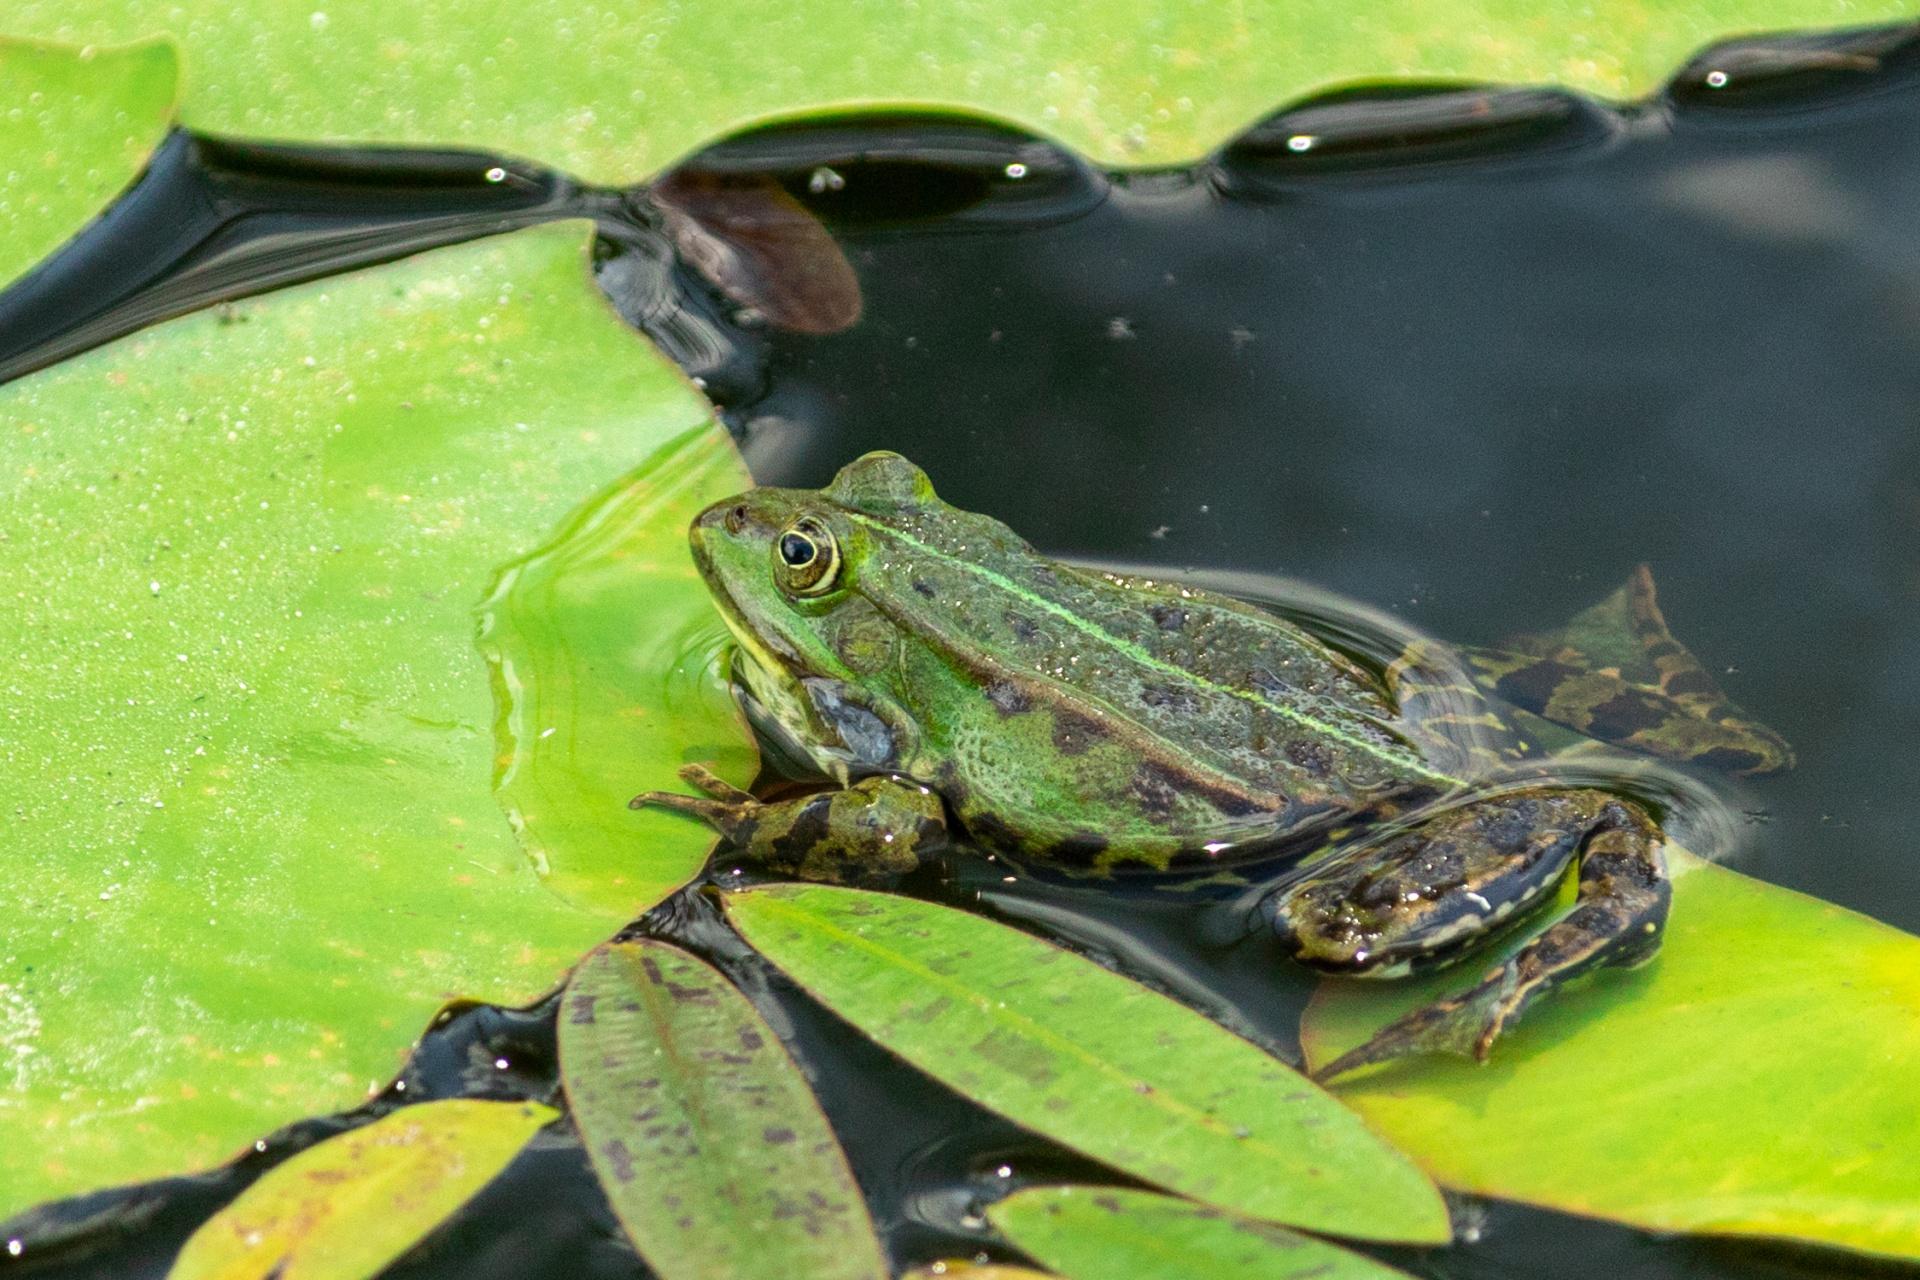 青蛙 免費圖片 - Public Domain Pictures